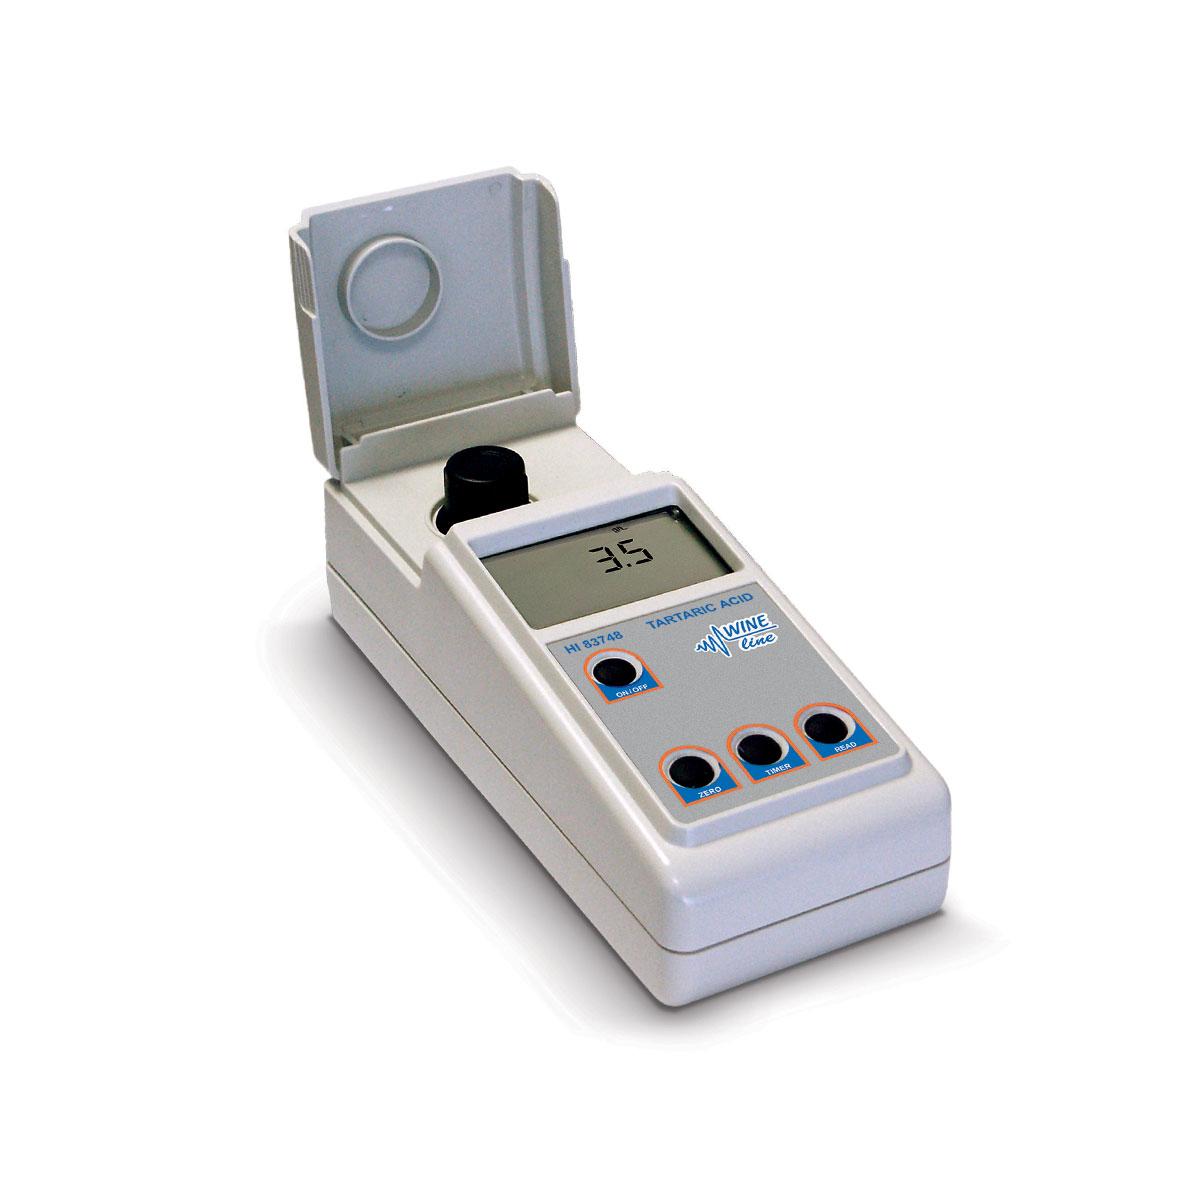 HI83748 Photometer for Tartaric Acid in Wine